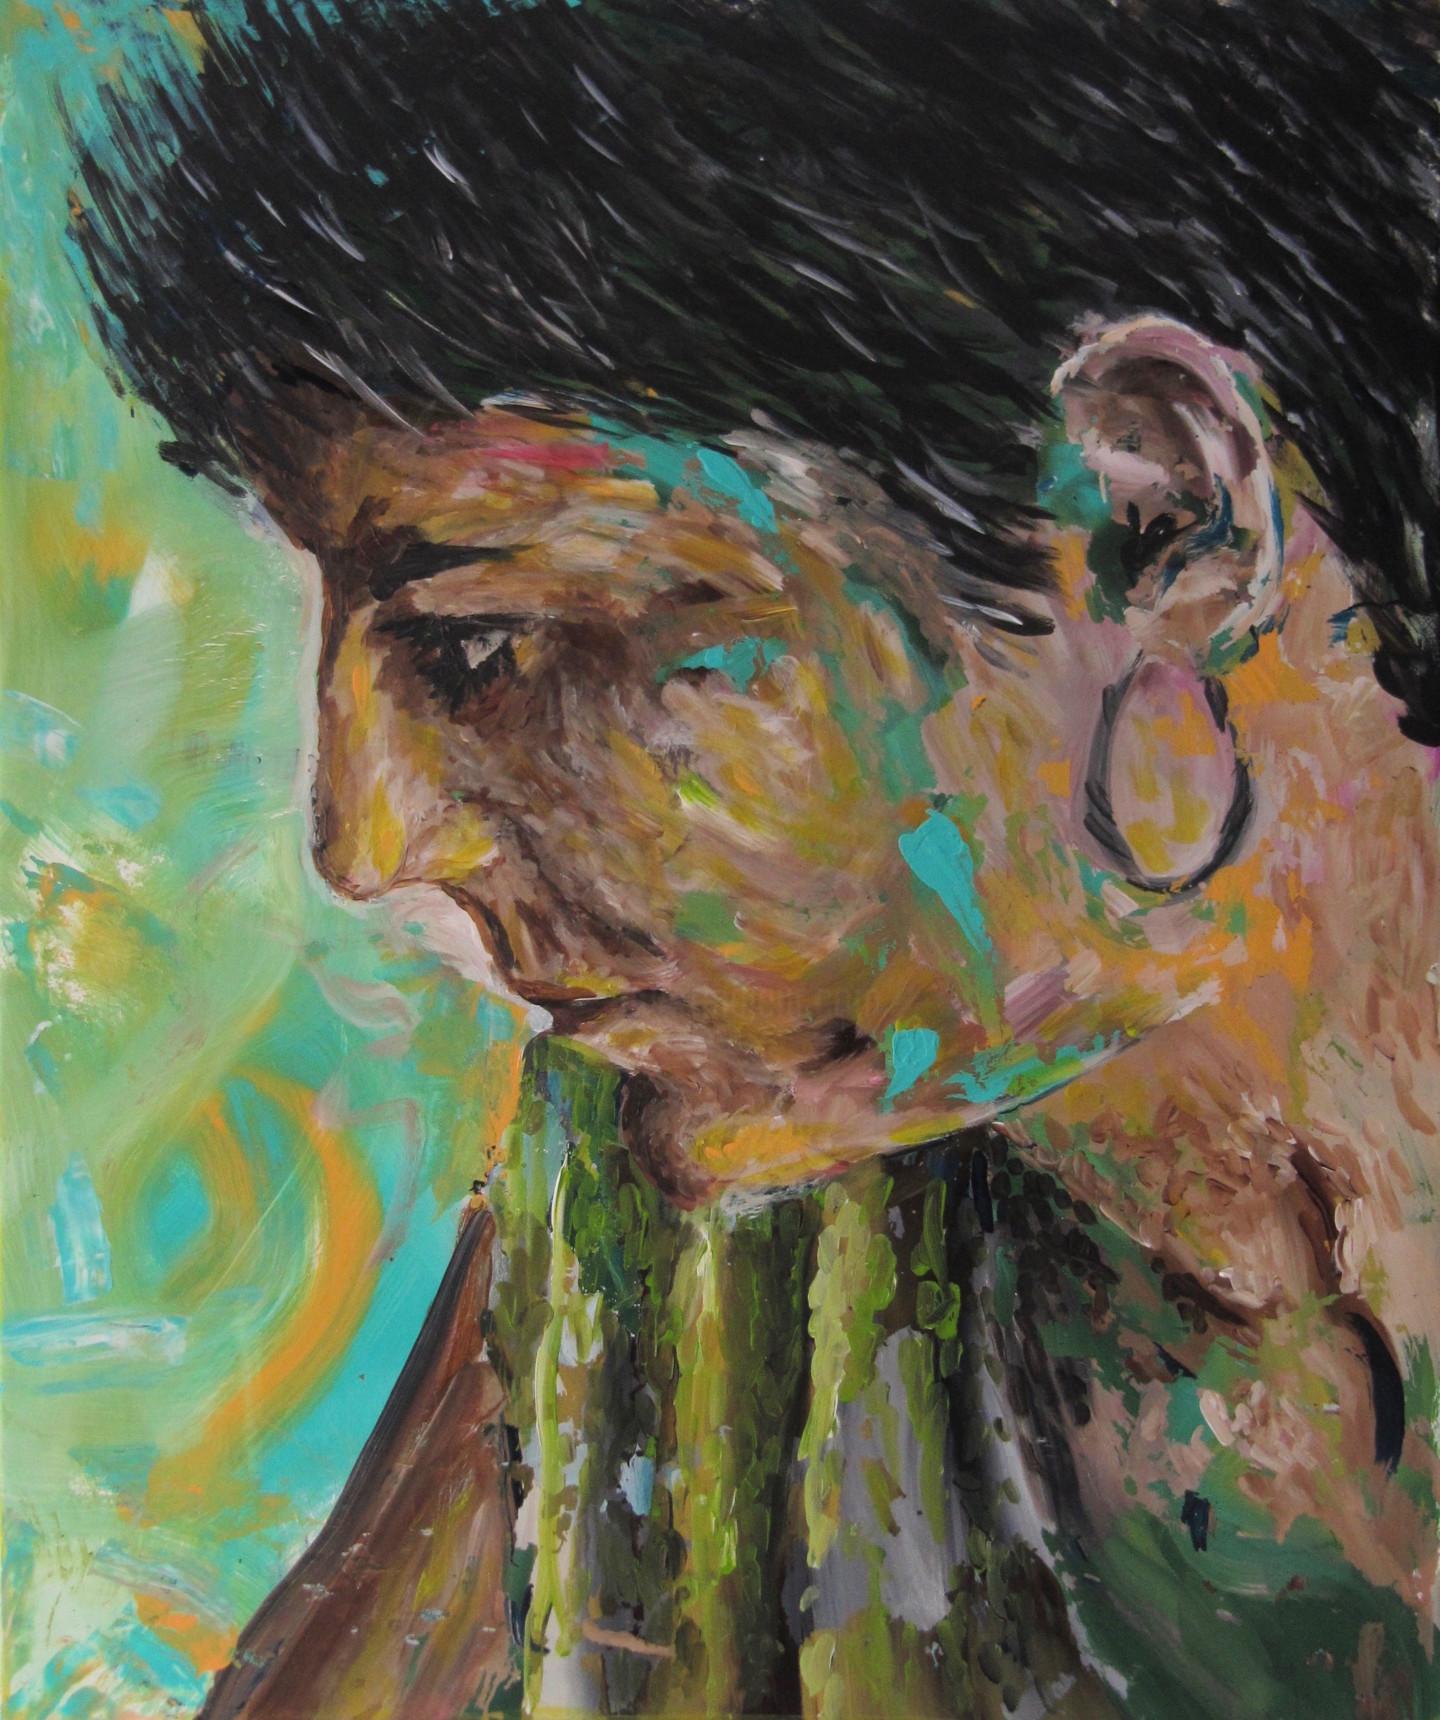 Gui Limão - Ana's portrait